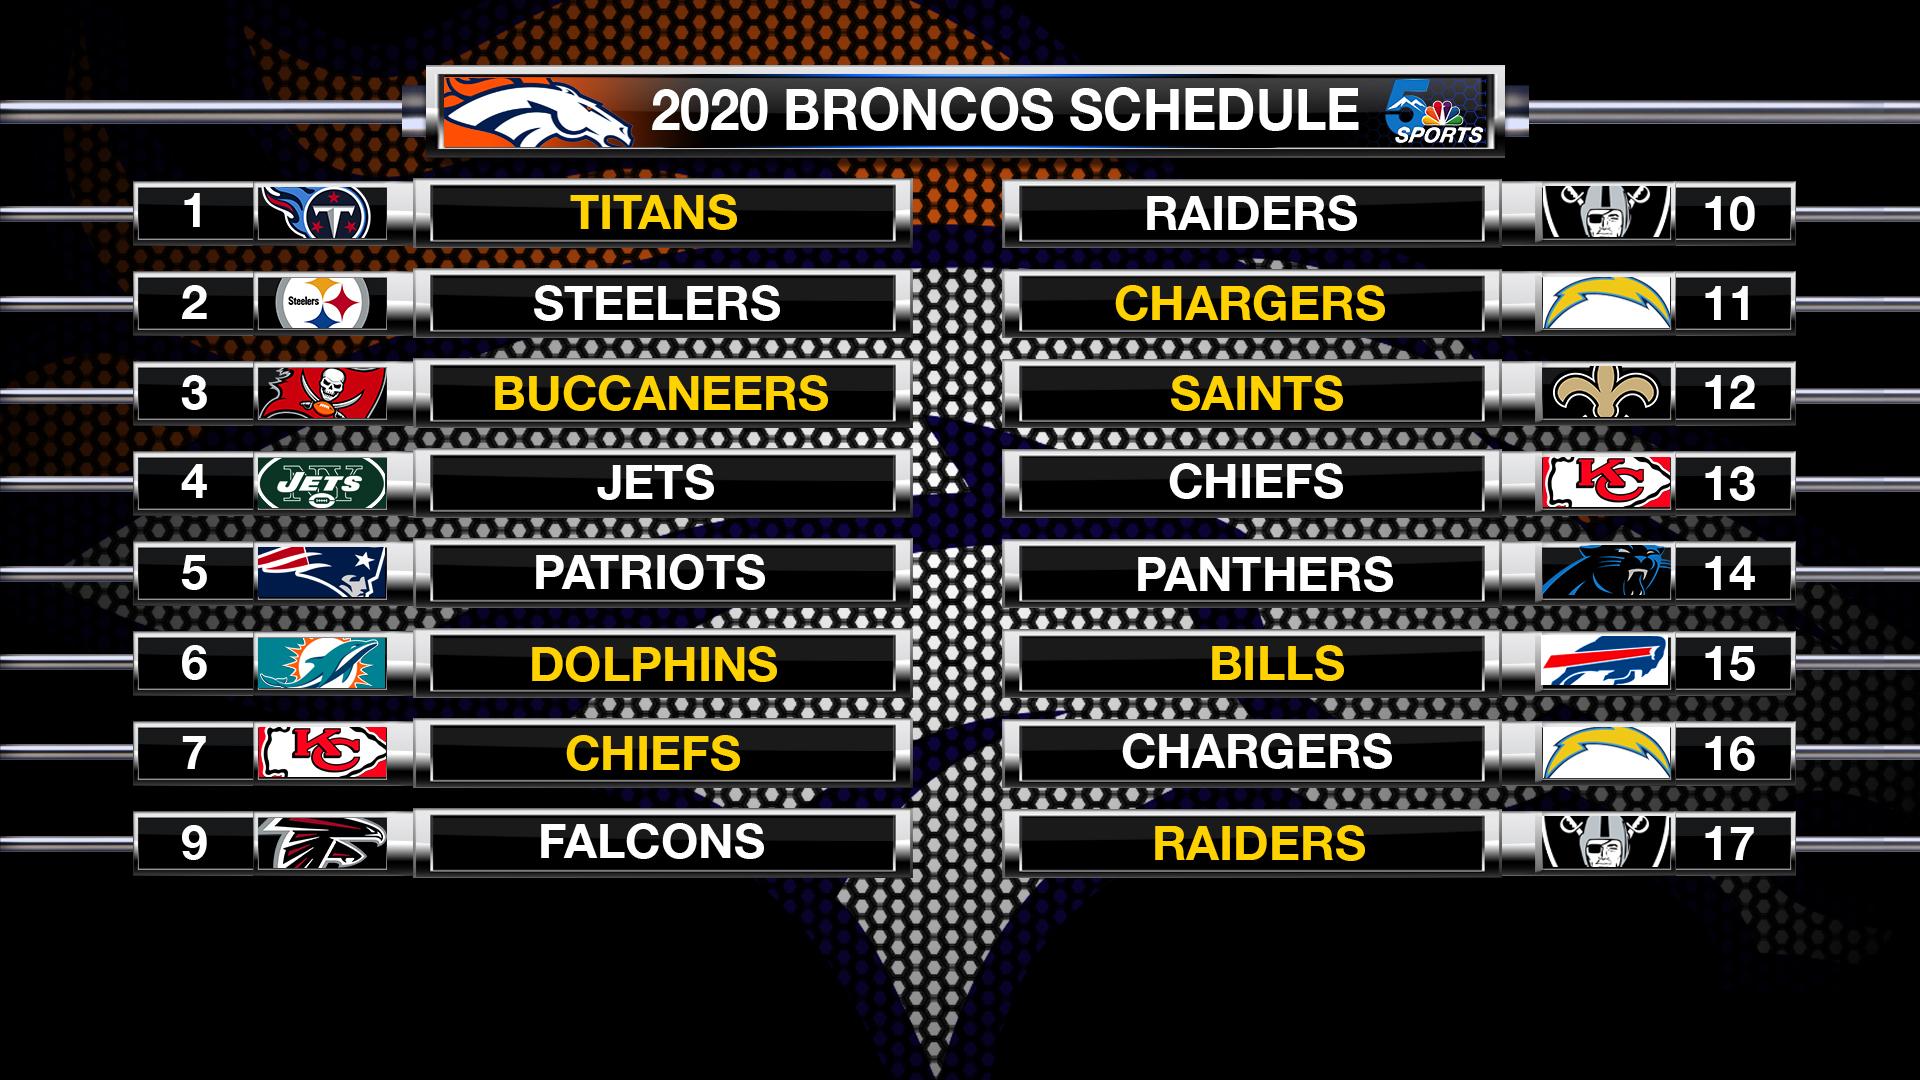 Broncos Release 2020 21 Schedule